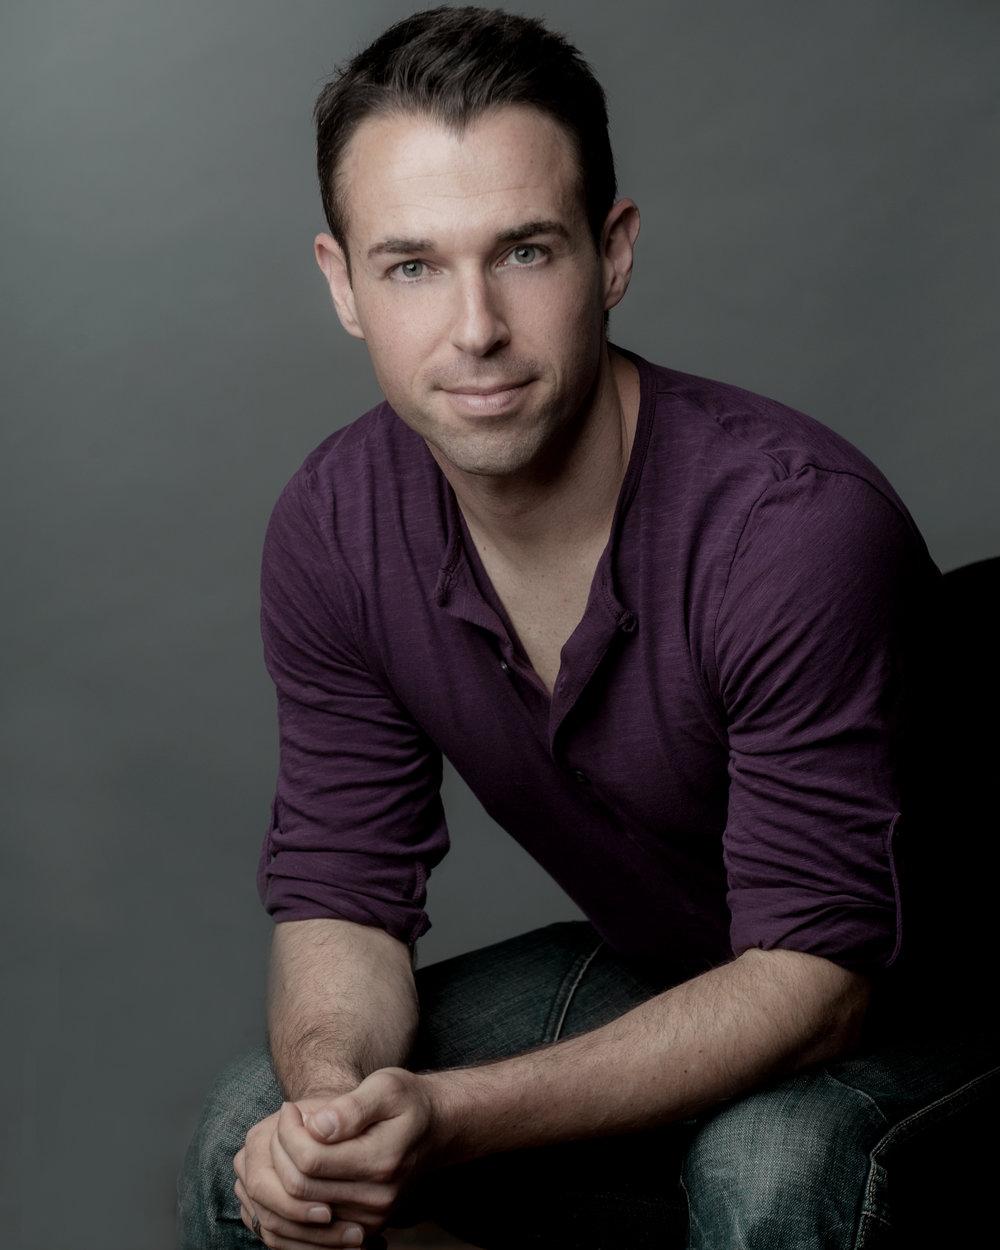 <b>Luke Alleva</b><br>choreographer